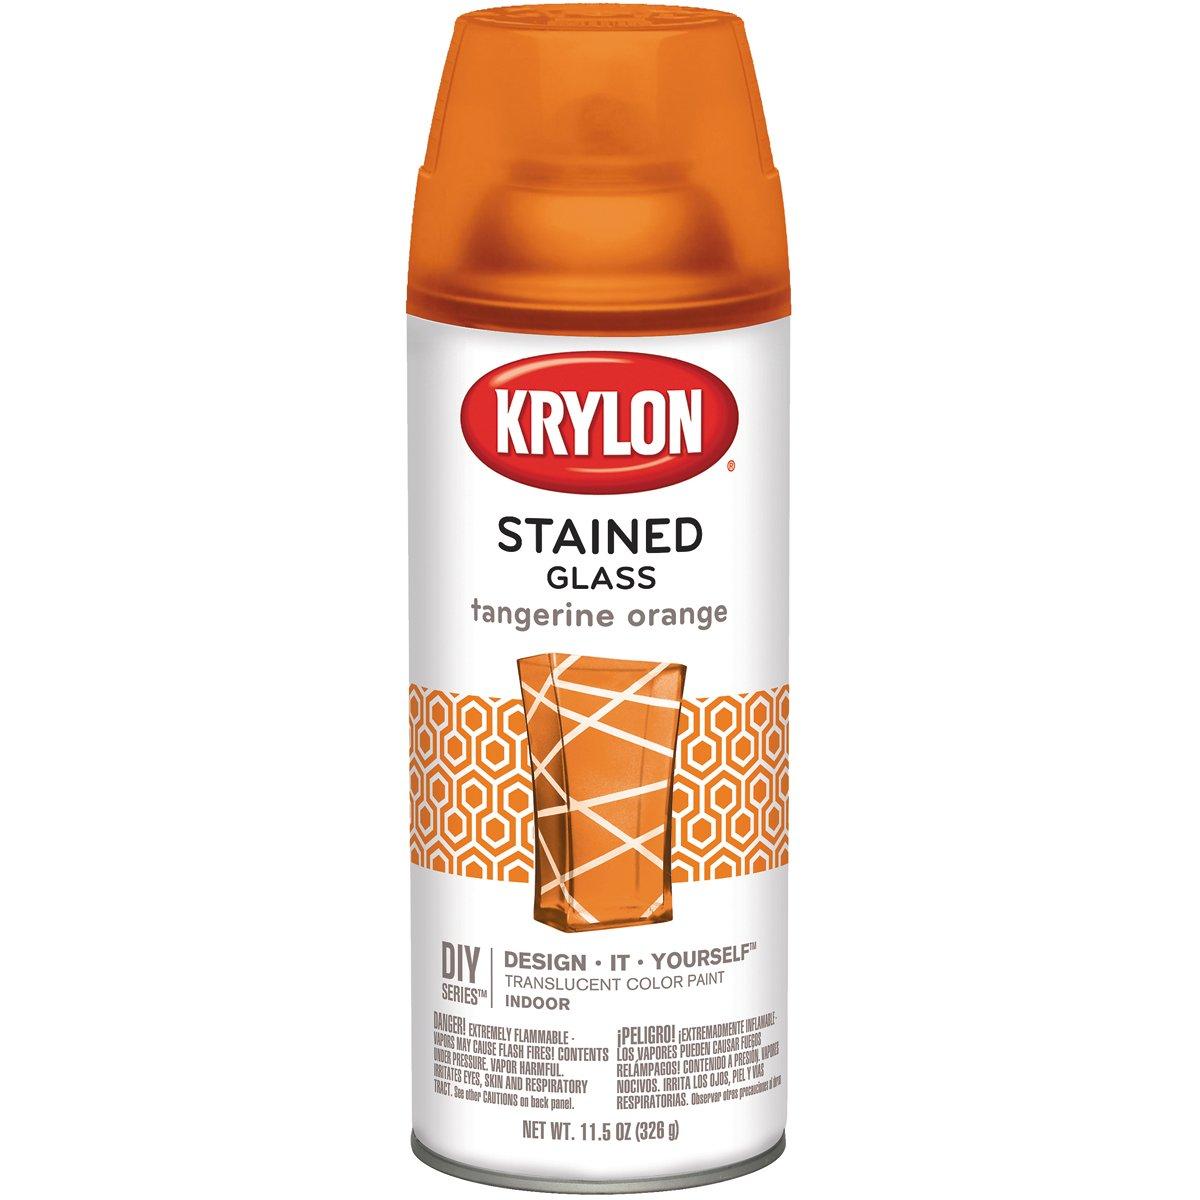 Krylon STG-9034 Stained Glass Paint 11.5oz - Tangerine Orange